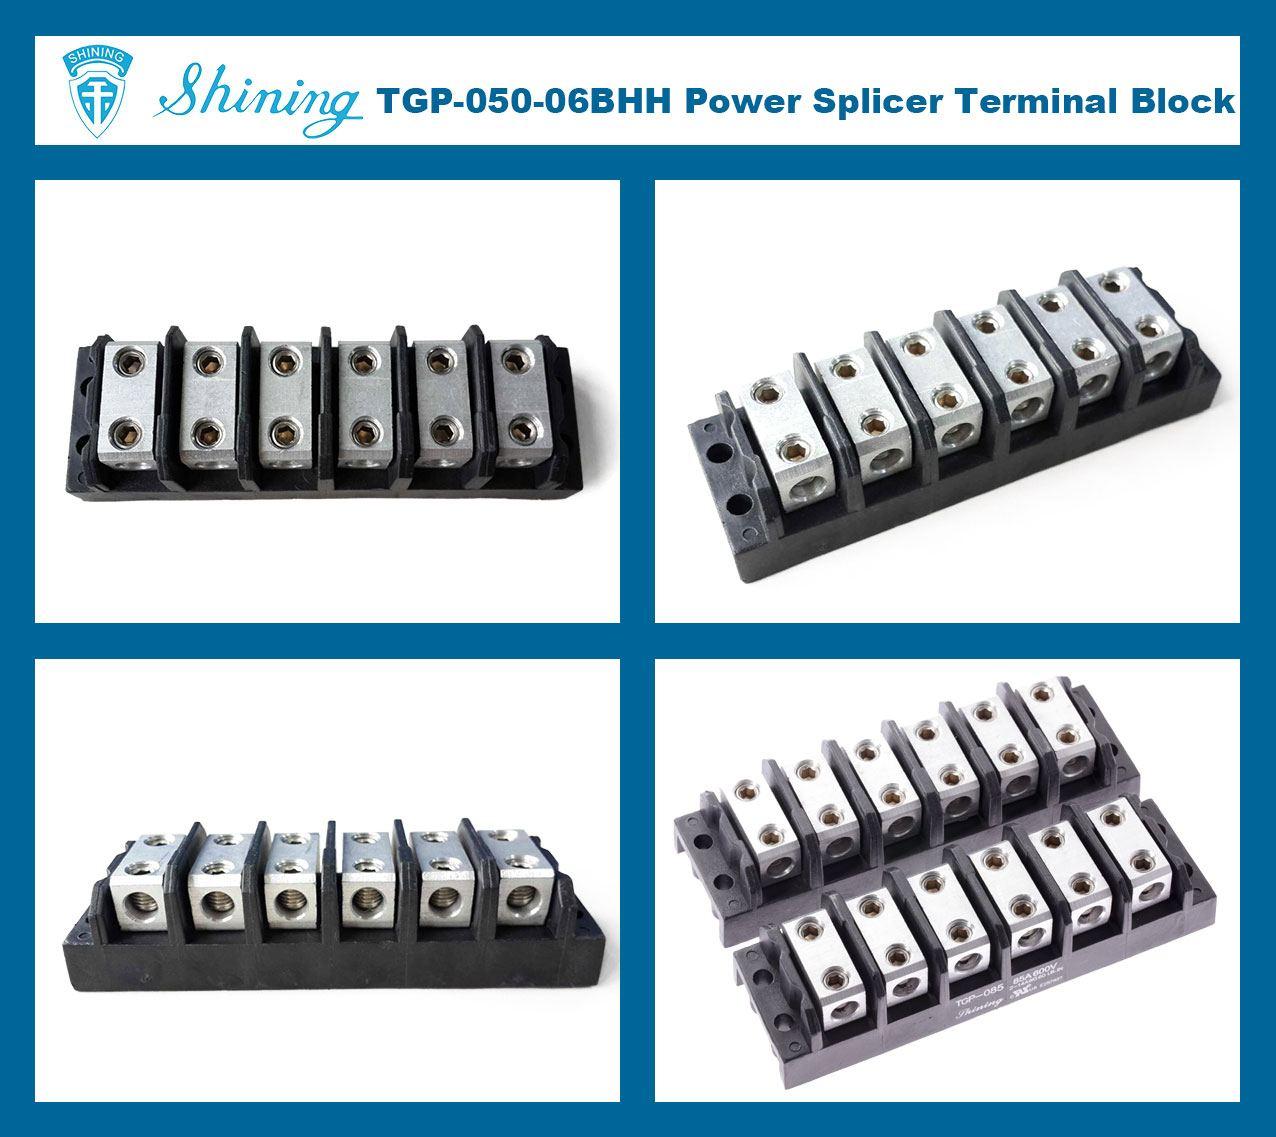 TGP-050-06BHH 600V 50A 6 Way Power Splicer Terminal Block